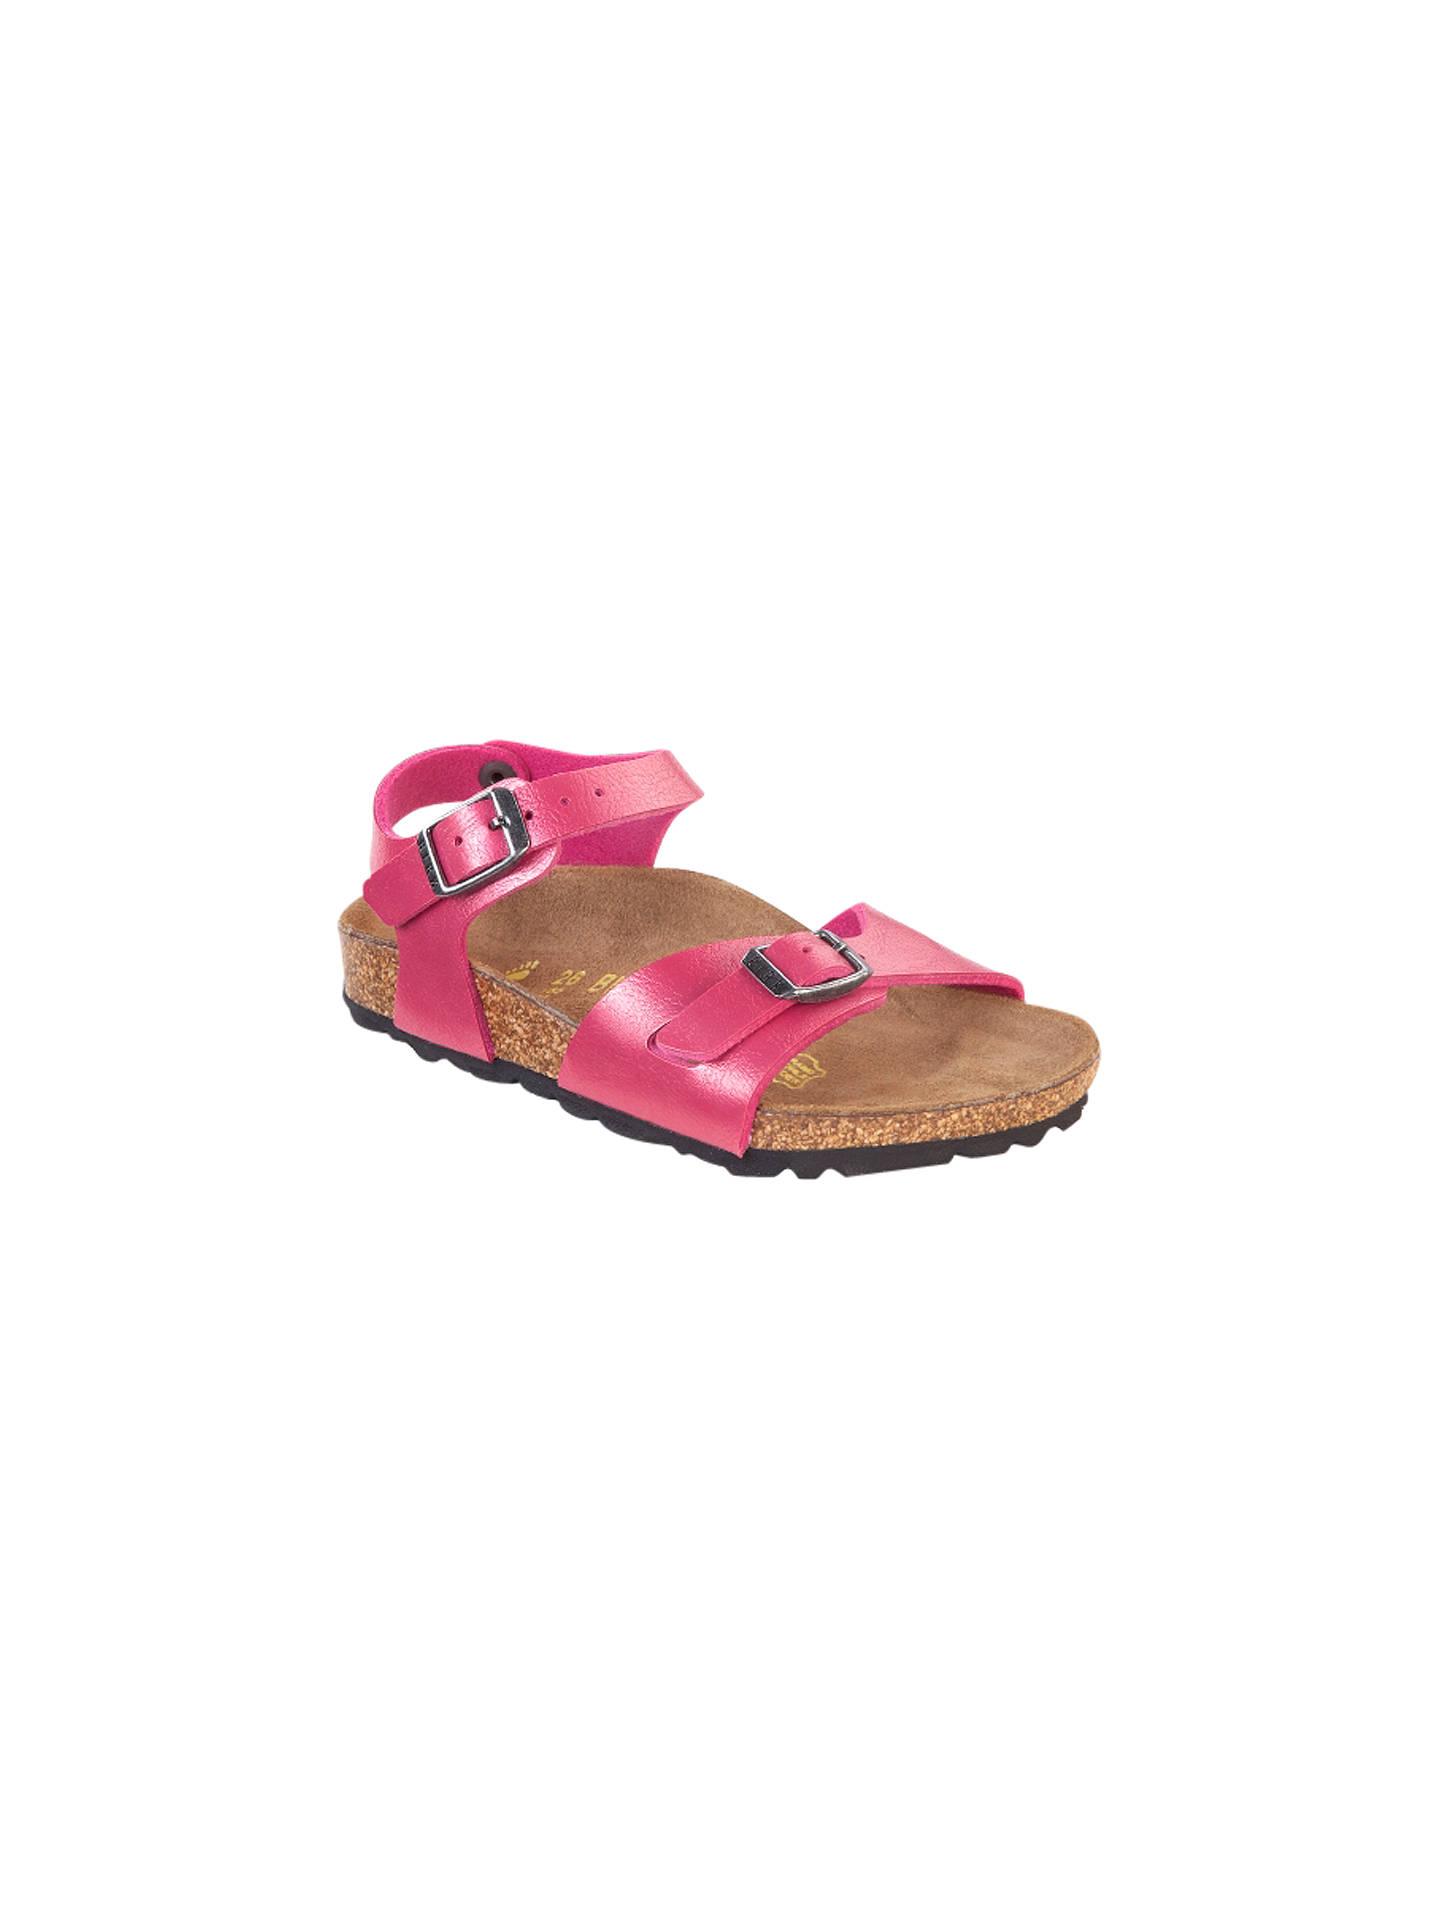 3f5dc1dd78f8 Buy Birkenstock Rio Sandals